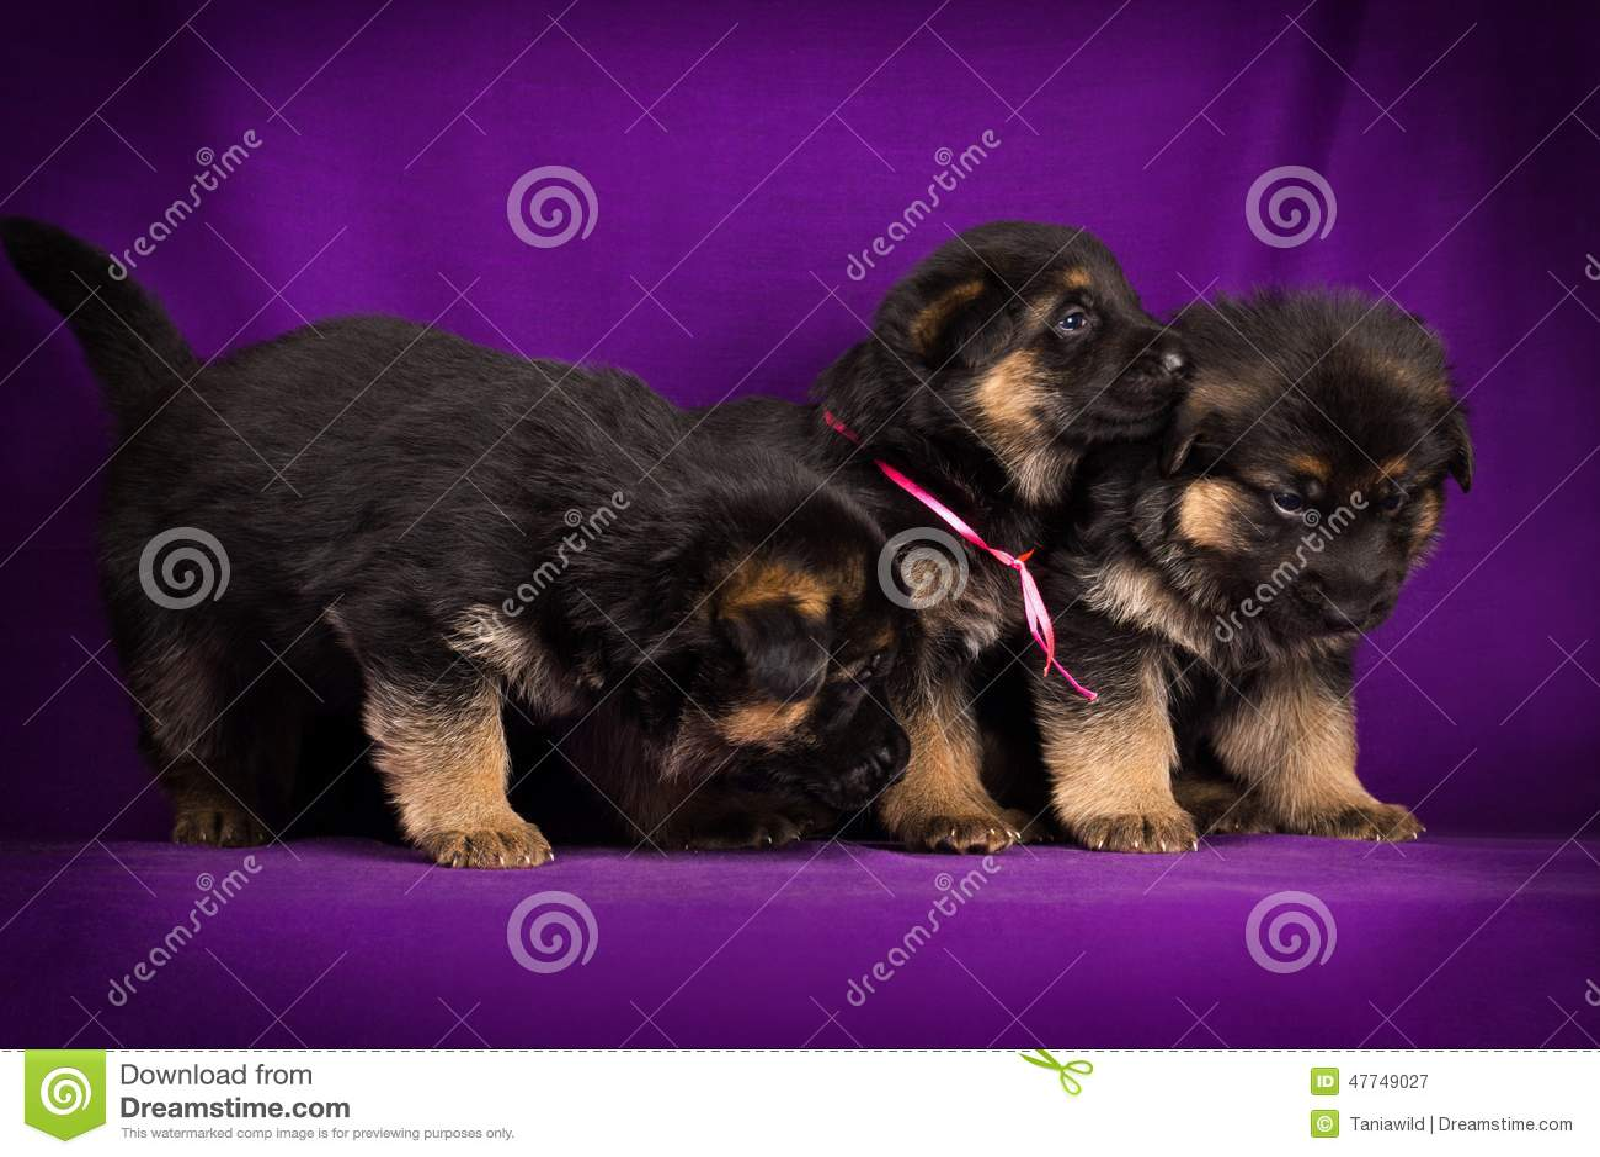 Three German Shepherd puppy on a purple background.